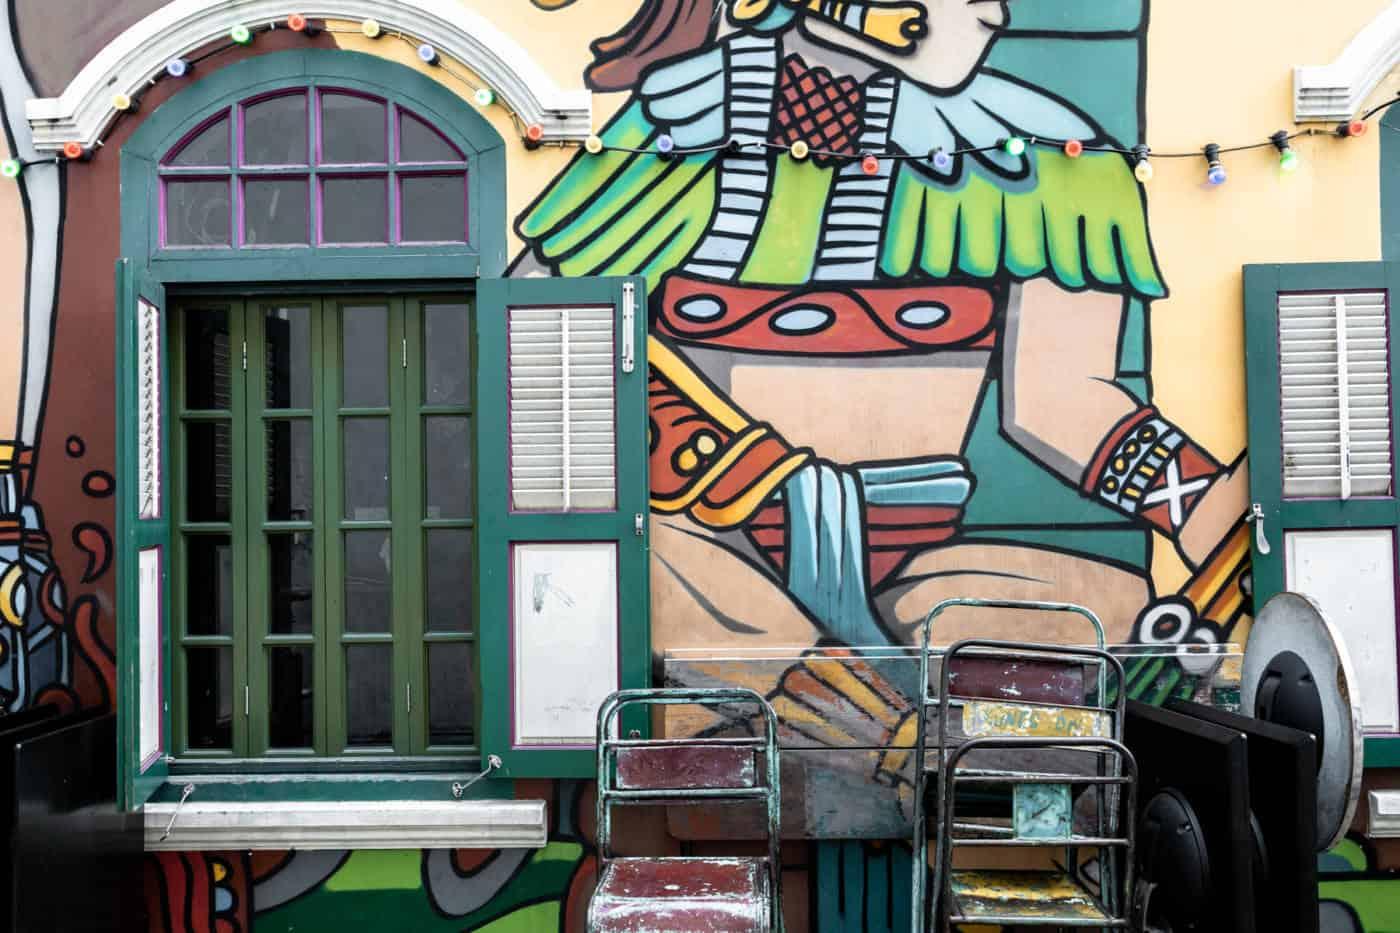 Wall murals in Haji Lane Singapore